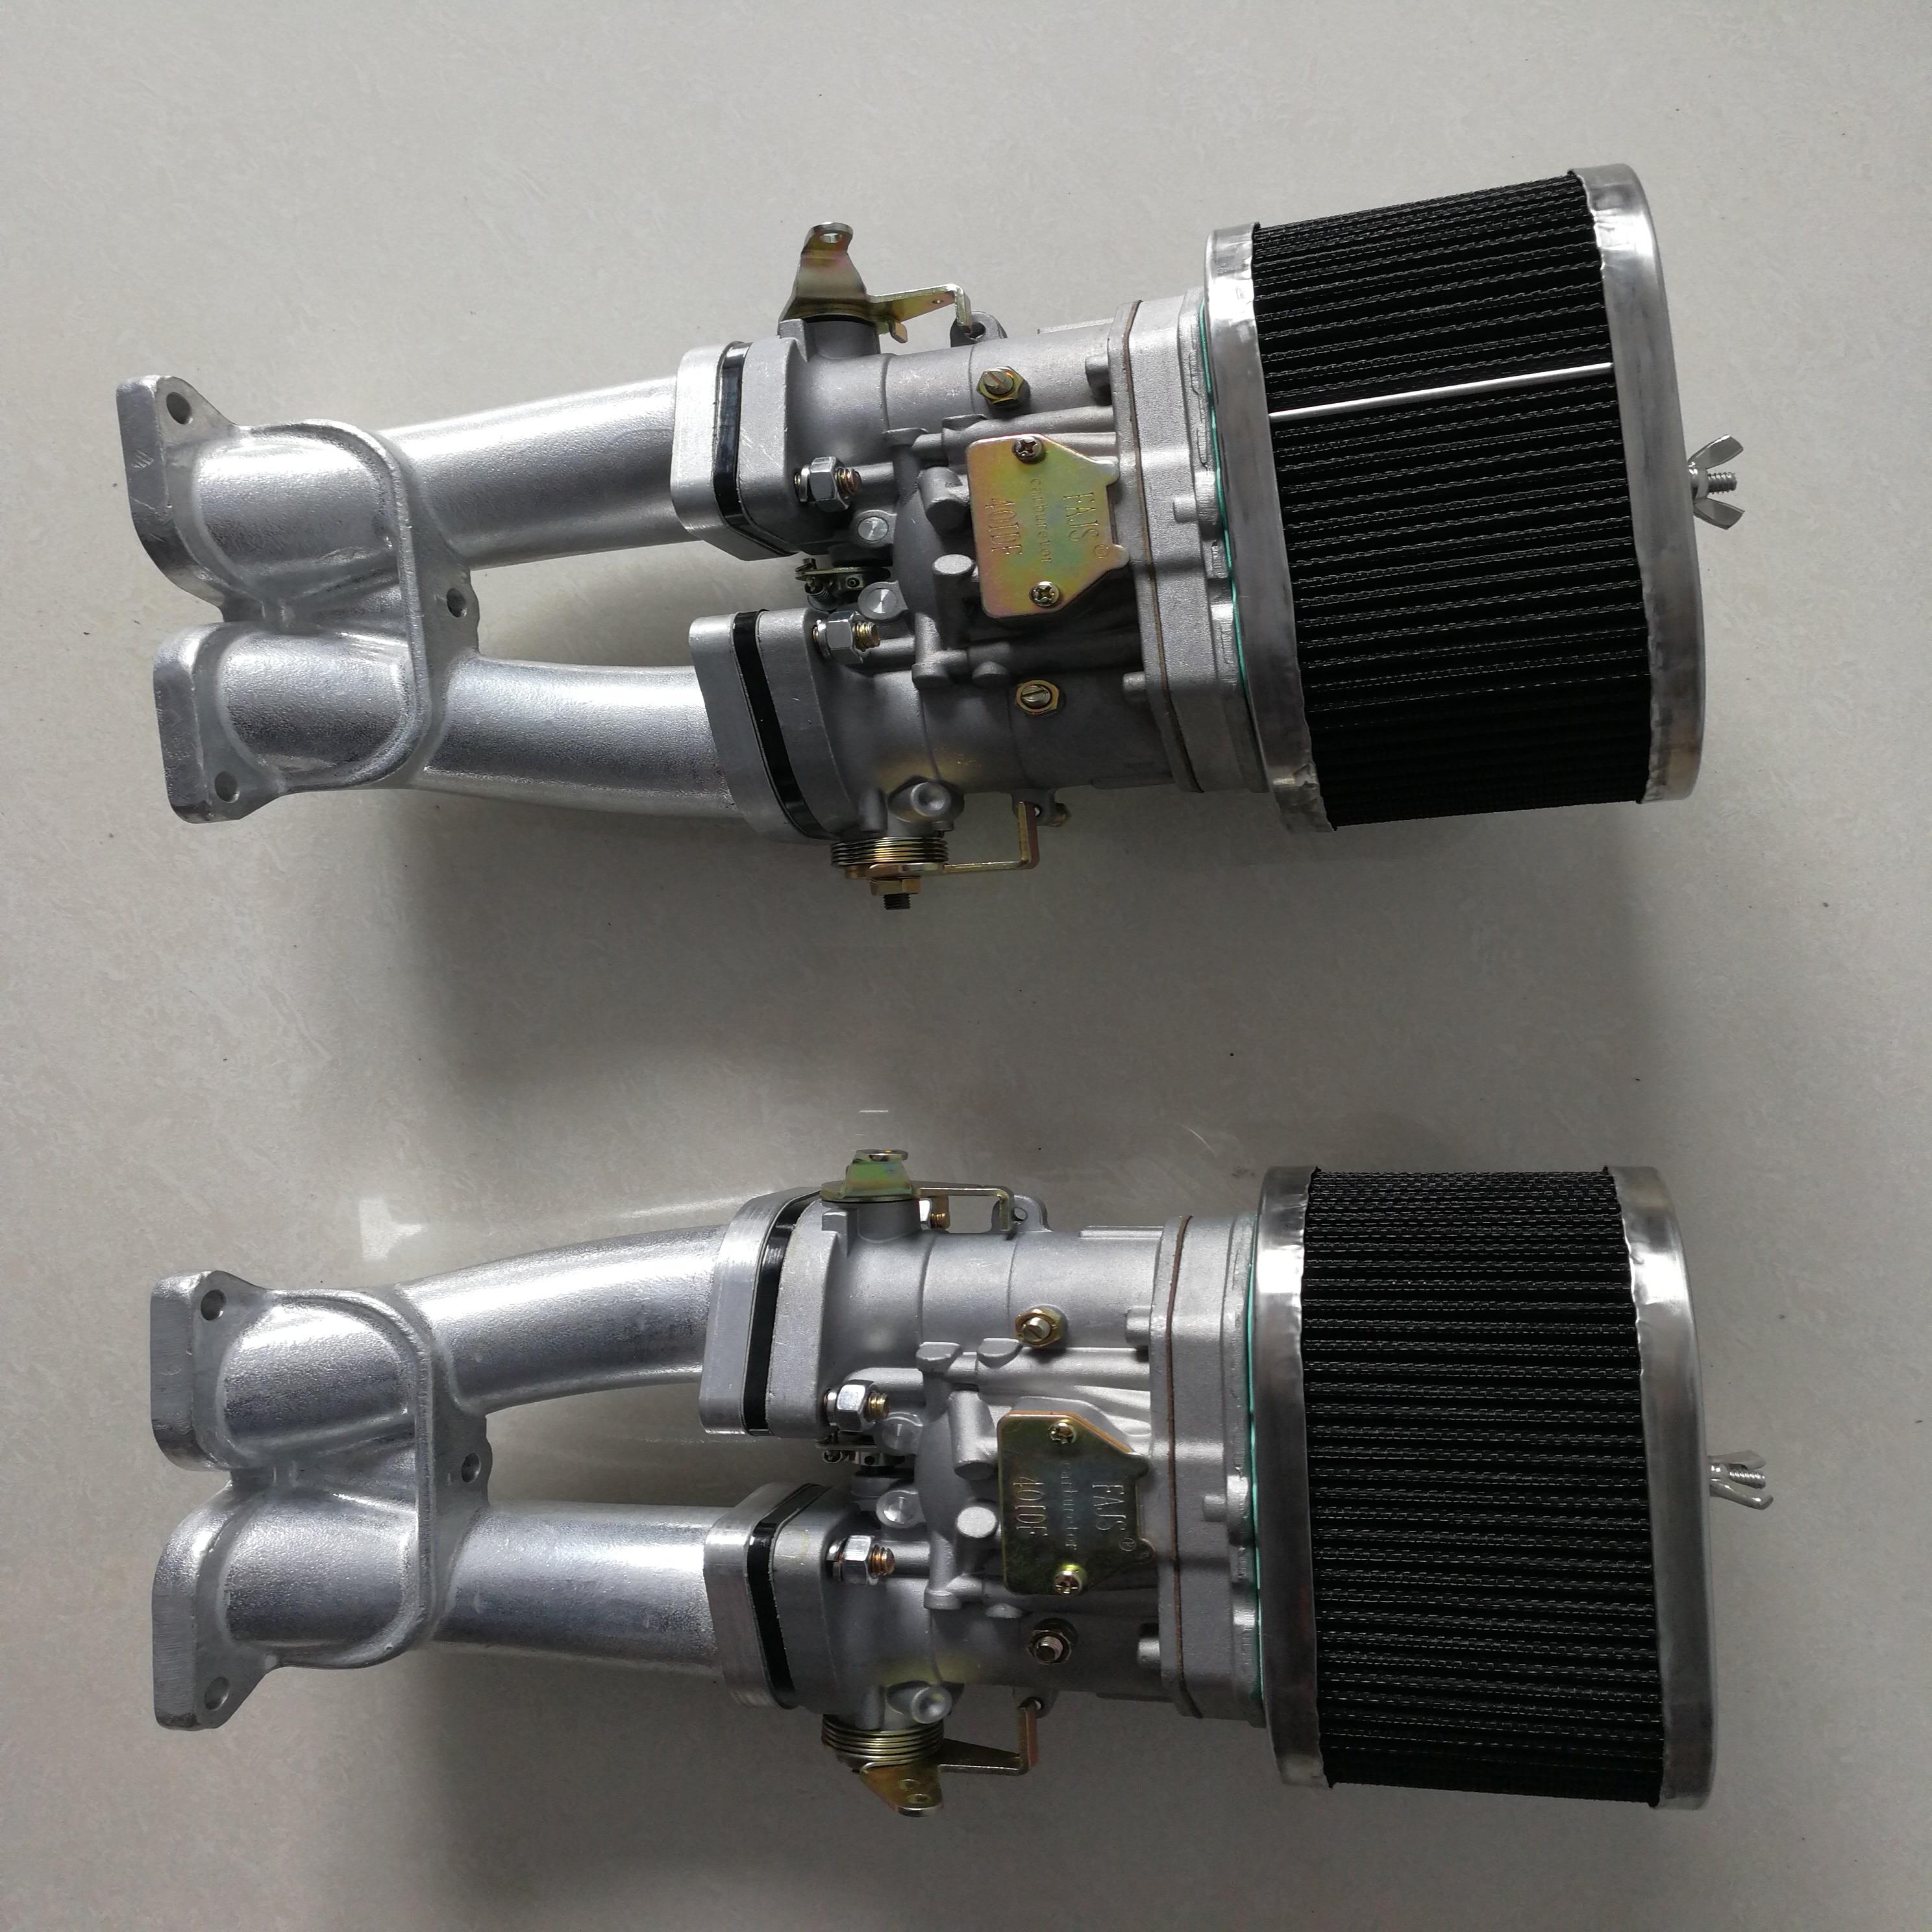 SherryBerg FAJS carburetor  carb conversion kit 48IDF 48 mm IDF T4 TYPE  48IDF Carbs for porsch 356A 356B 356C 356SC SC90 912